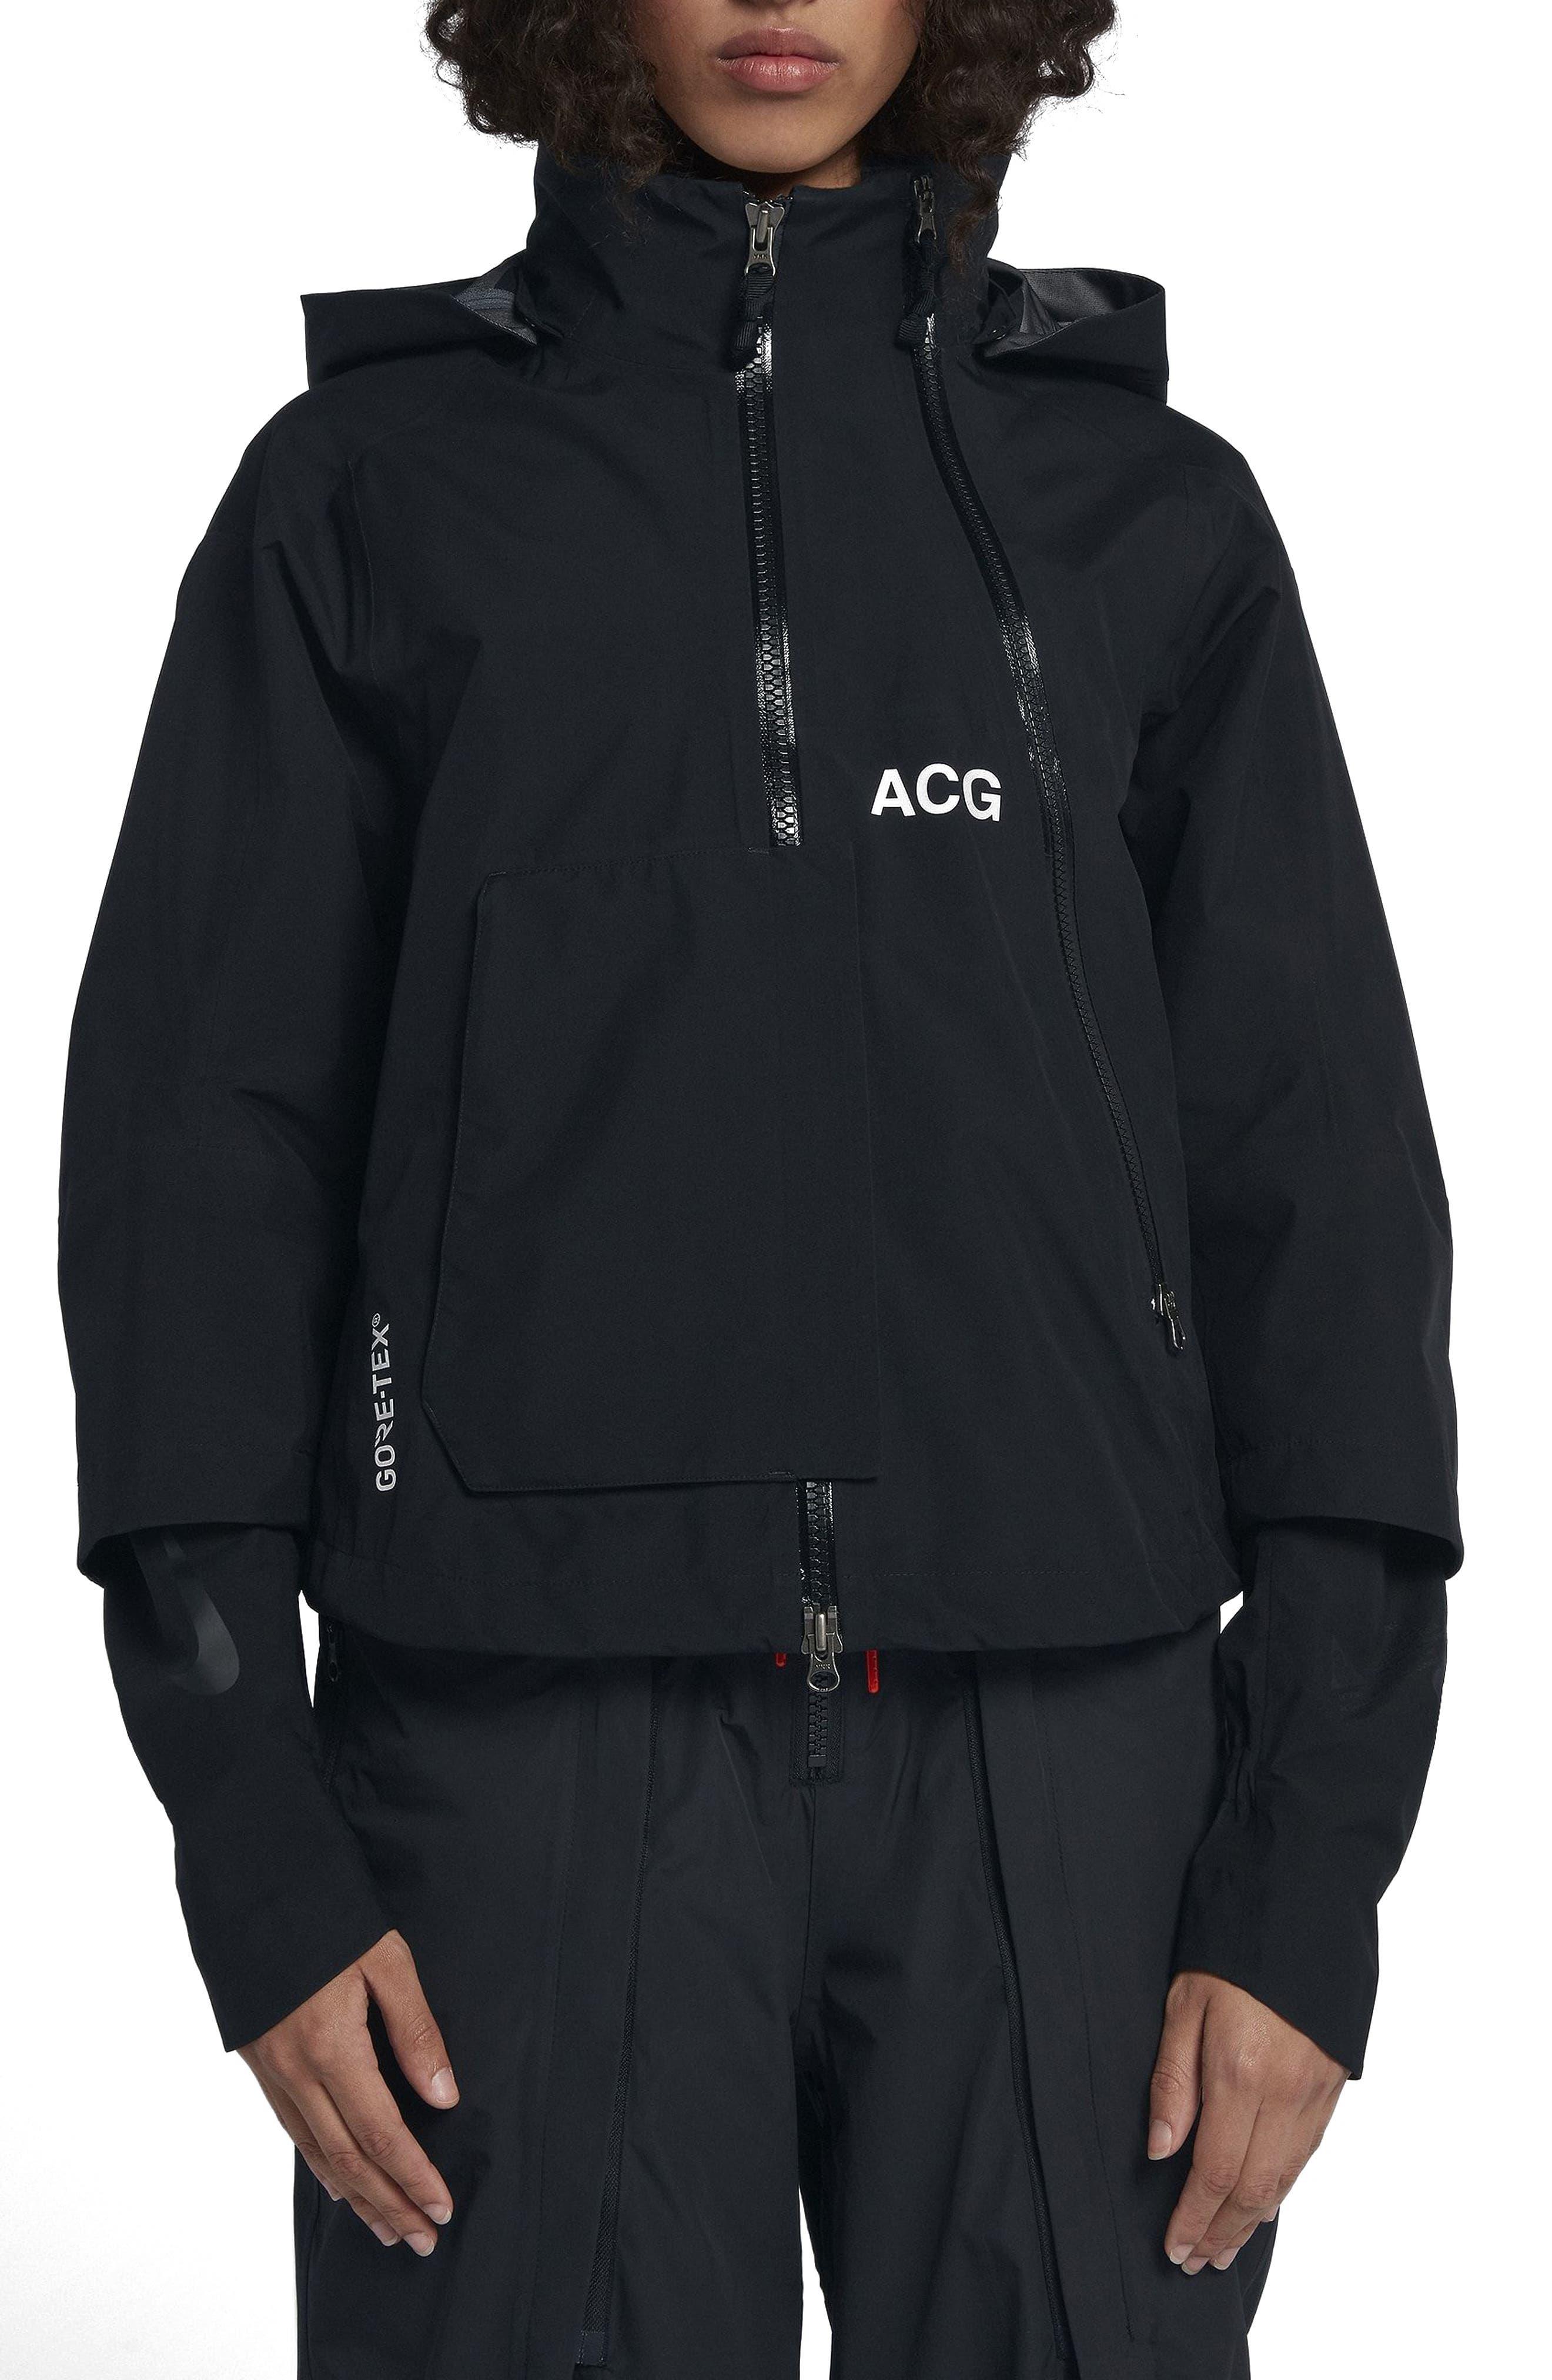 NikeLab ACG Gore-Tex<sup>®</sup> Women's Jacket,                         Main,                         color, 010